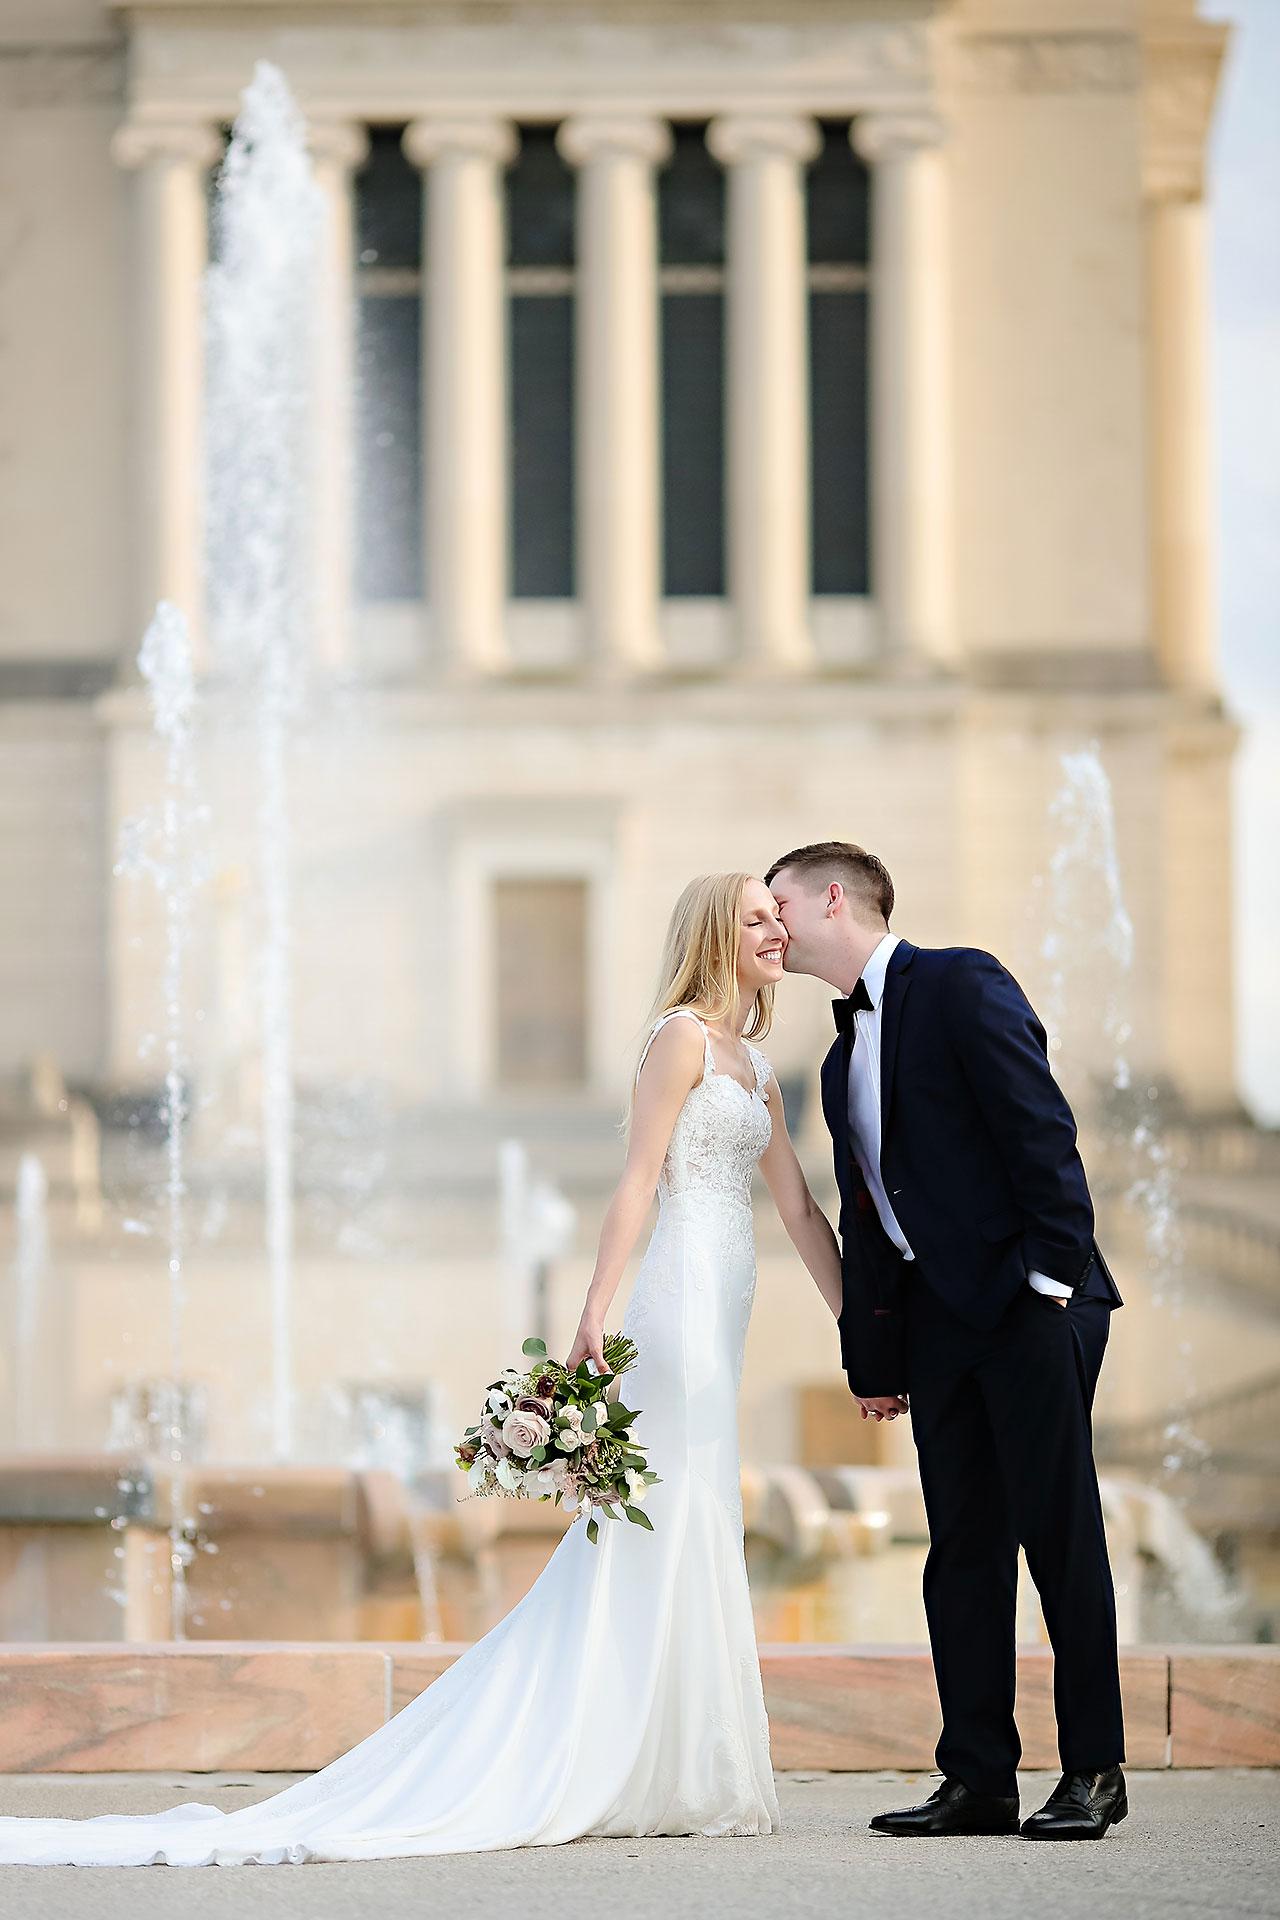 Molly Declan Scottish Rite Indianapolis Wedding 253